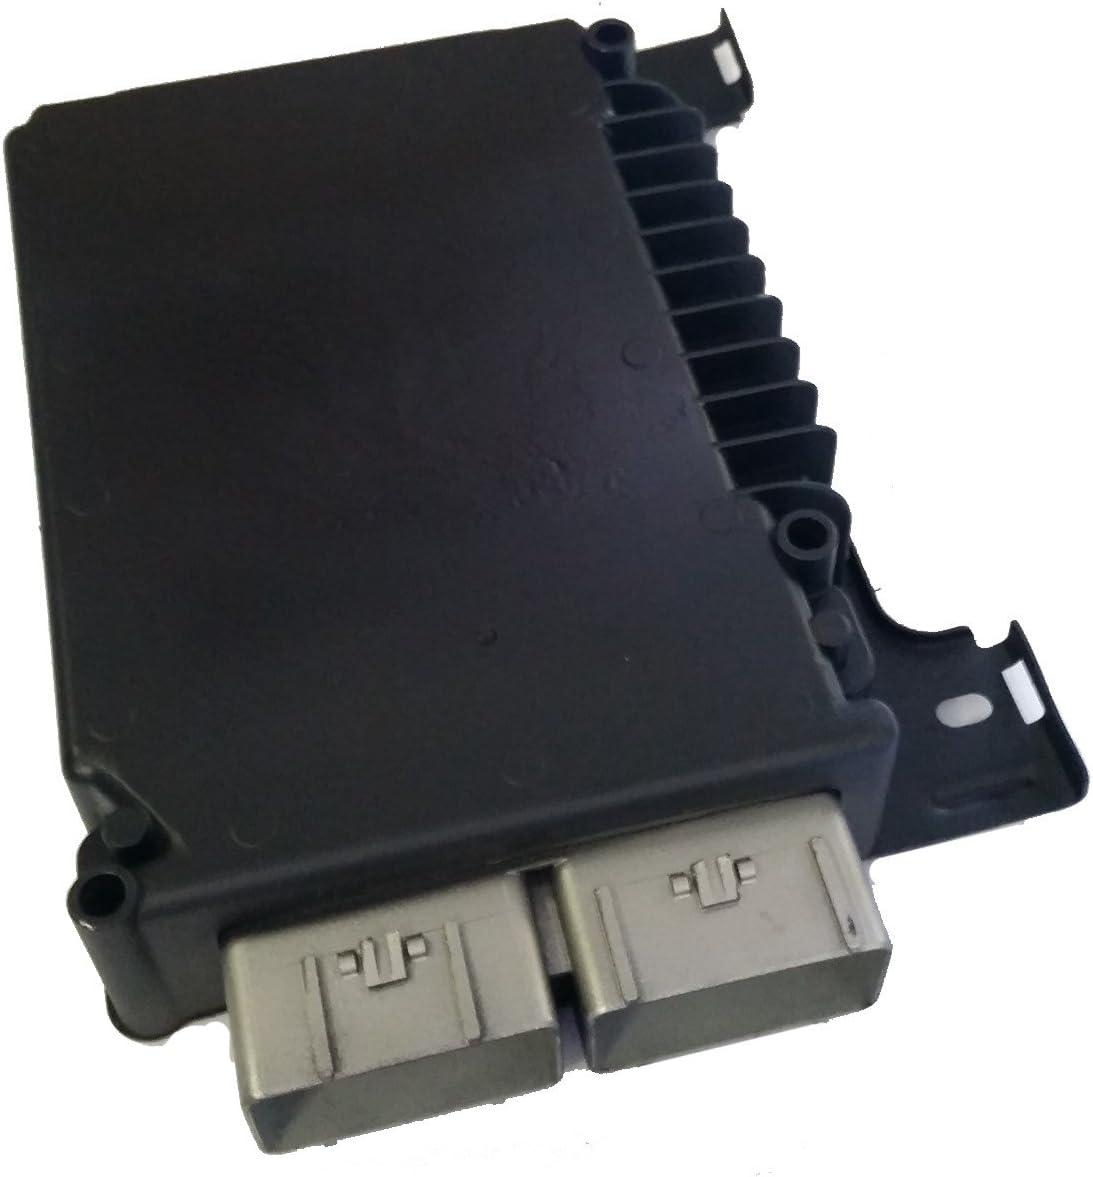 Flashmasters 2002 Compatible for Dodge Ram Truck 5.9L at 56028410 ECU ECM PCM Programmed to Your VIN